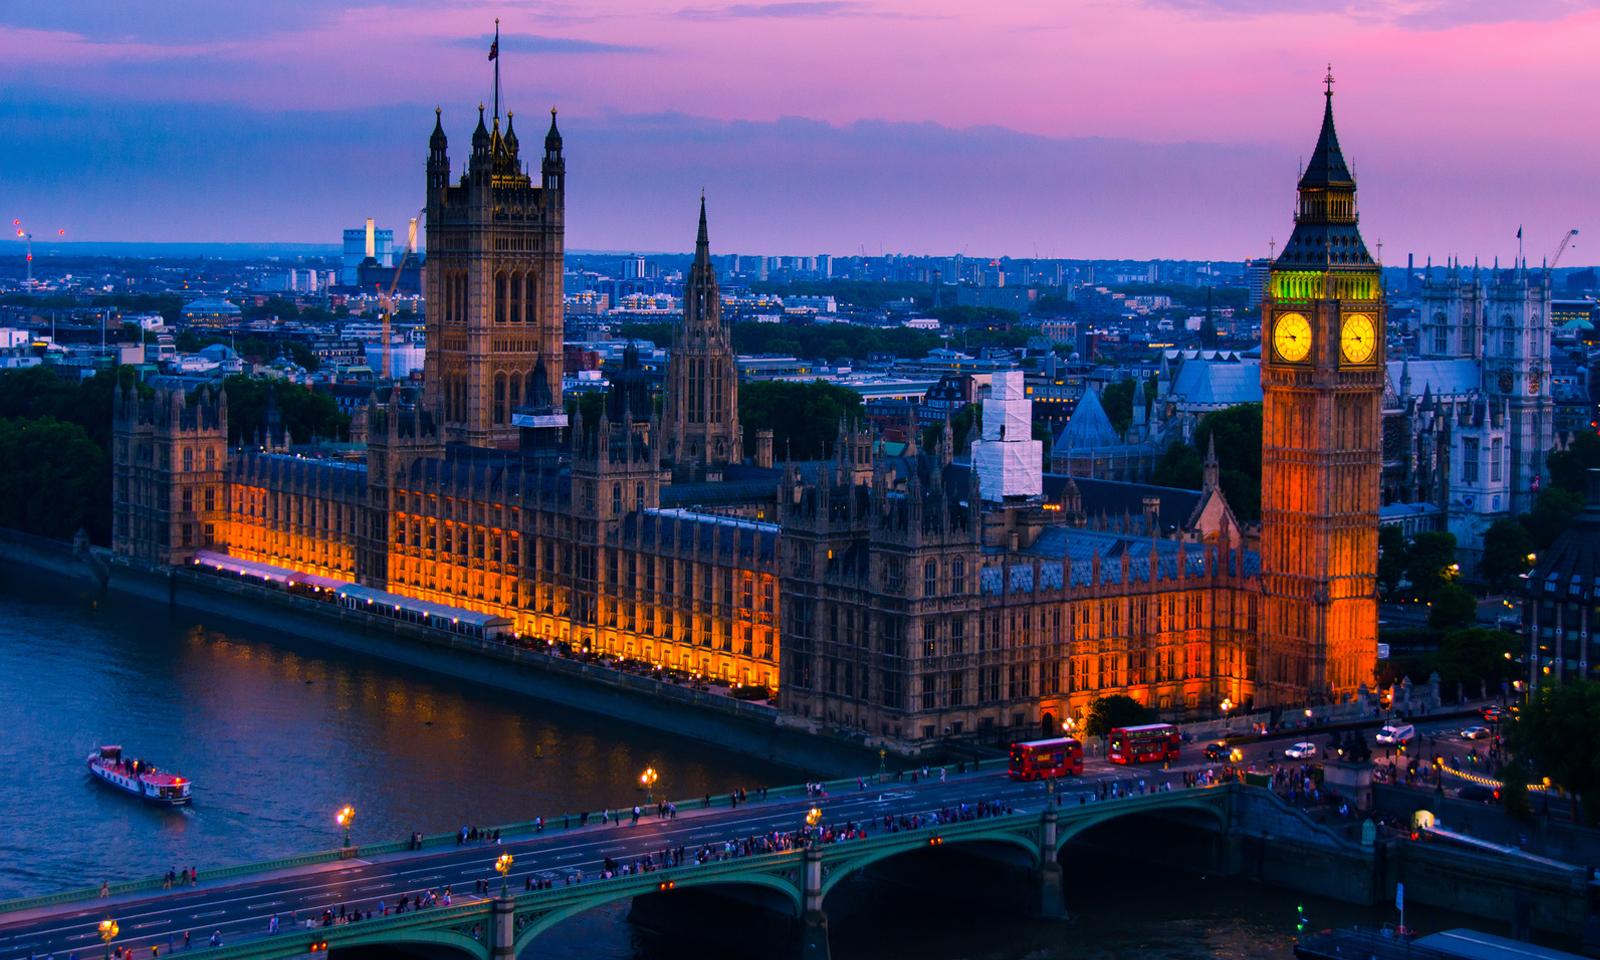 Биг бен картинки в лондоне